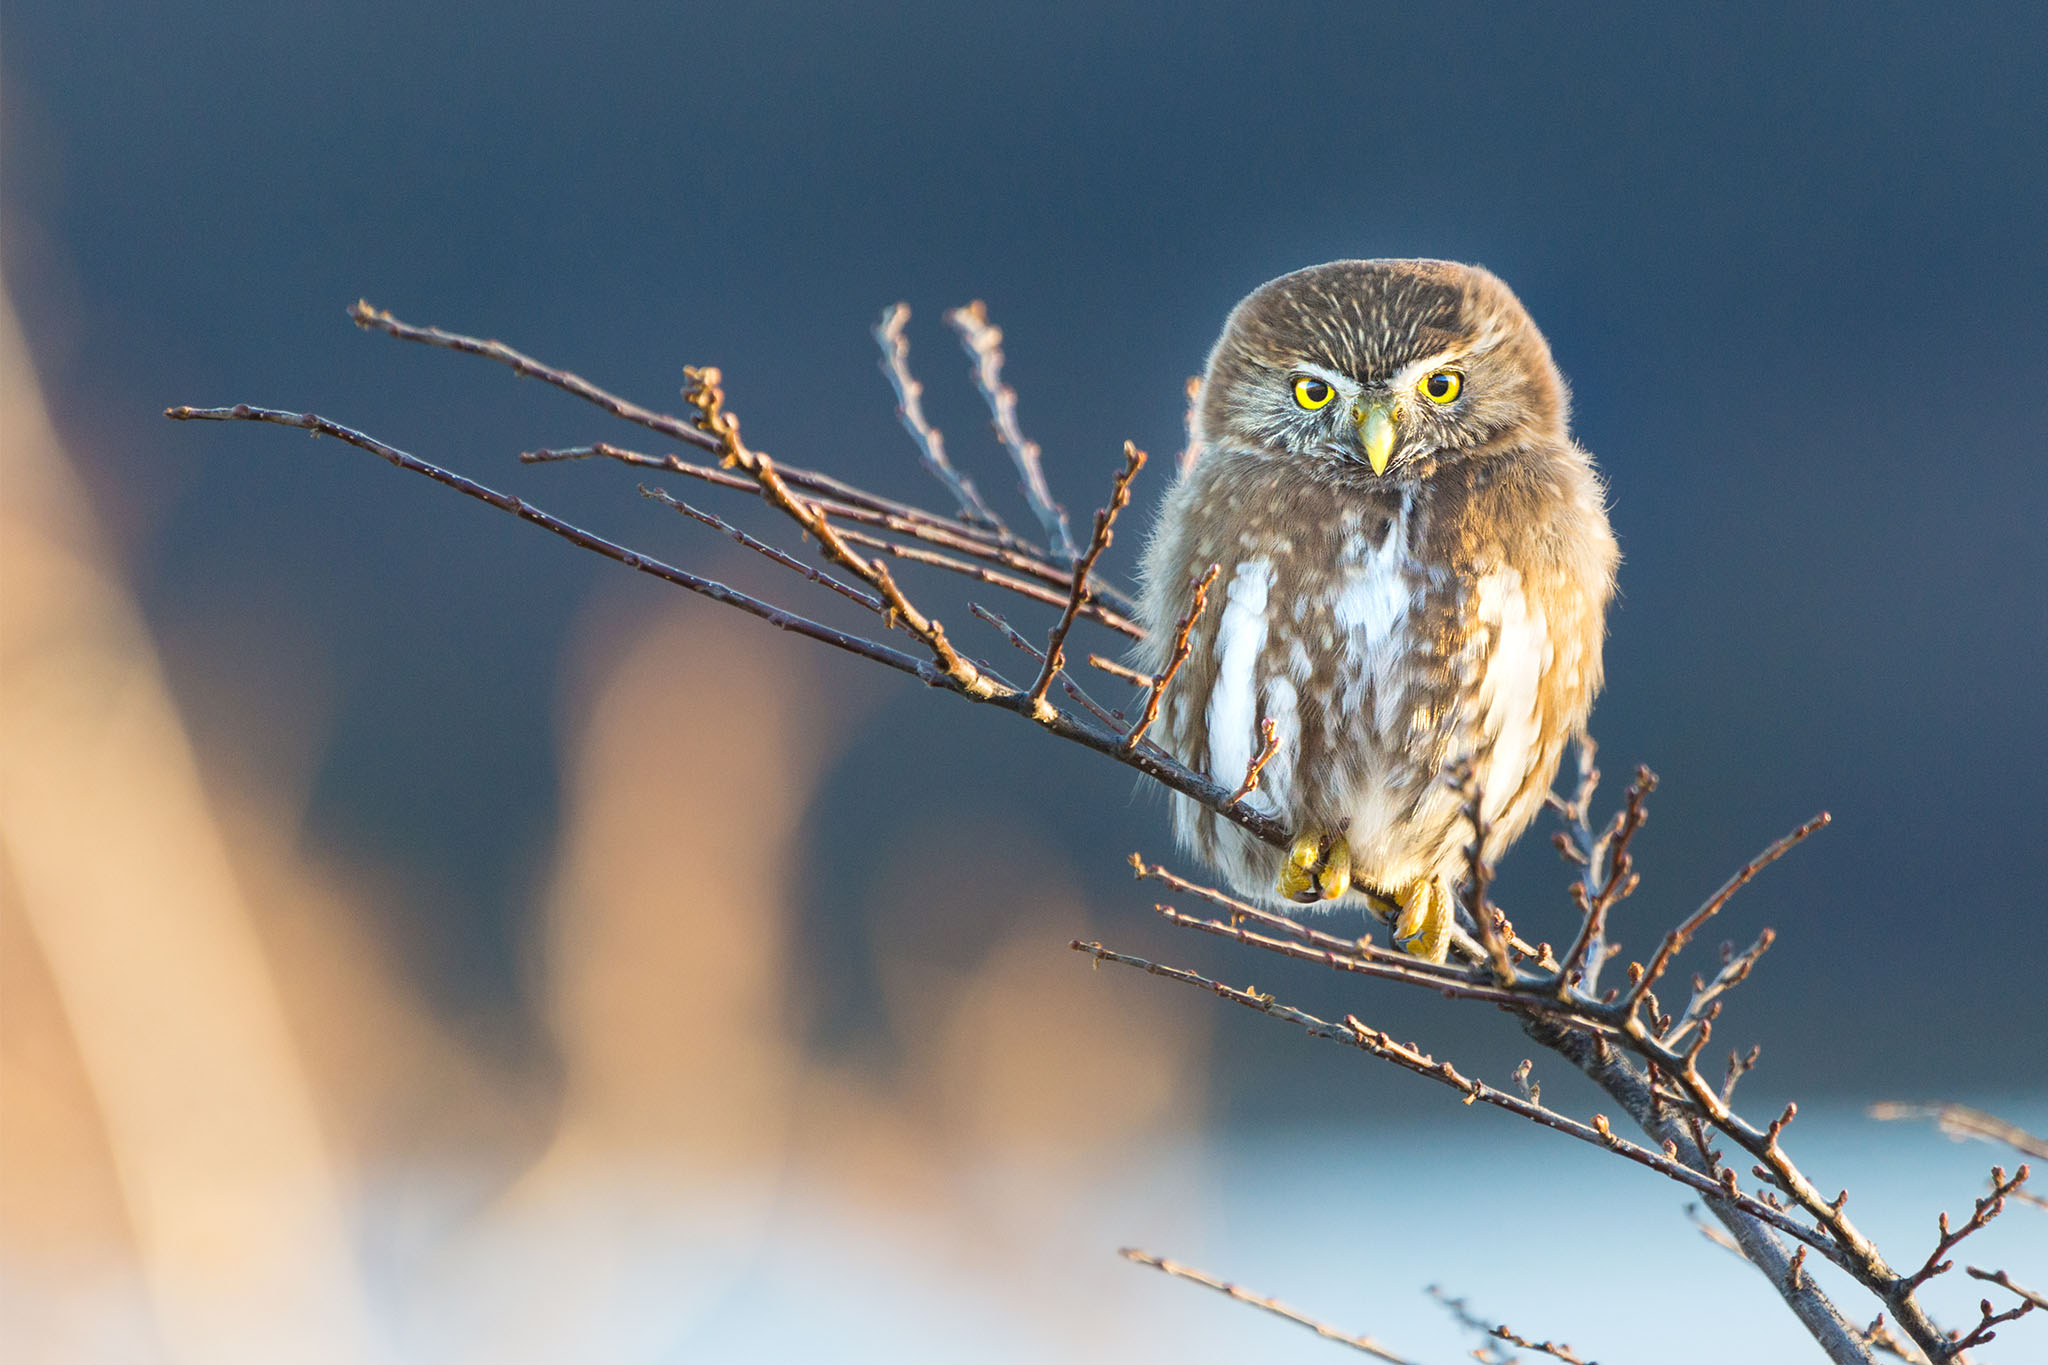 Fotografiando Aves y Mamíferos